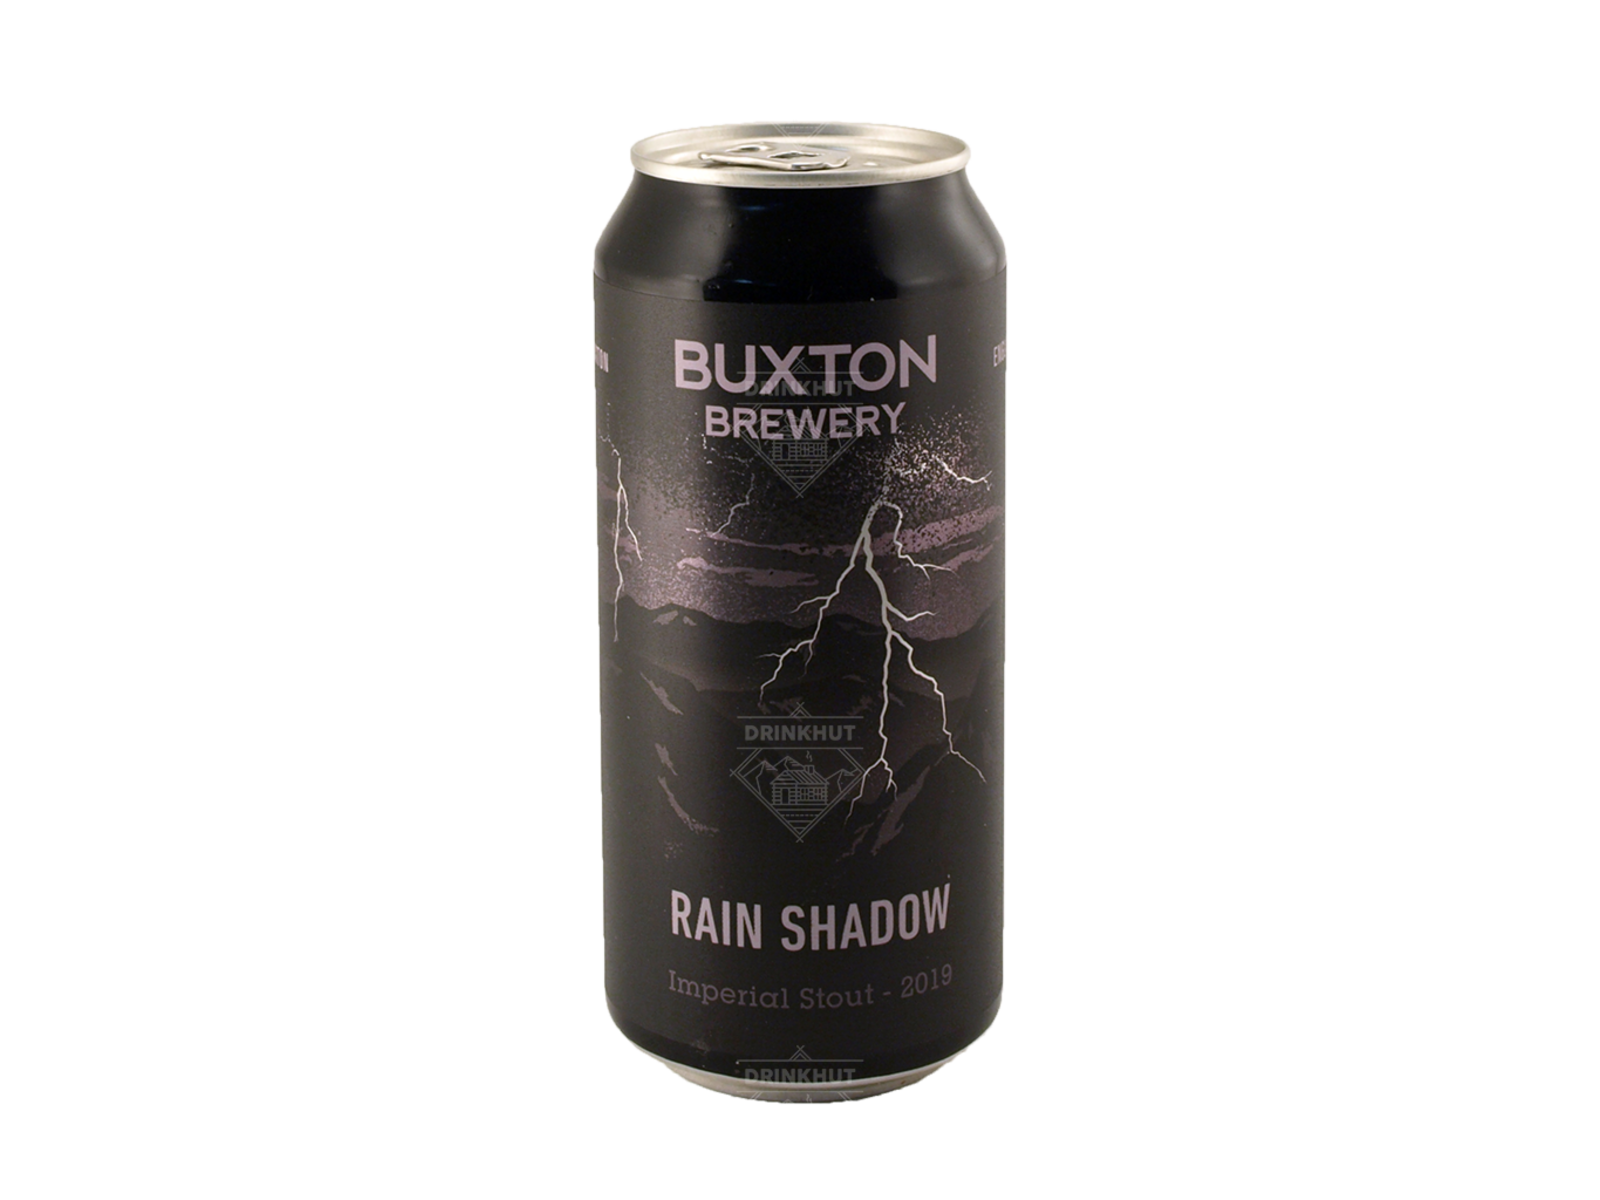 Buxton Brewery / Rain Shadow / Imperial Stout